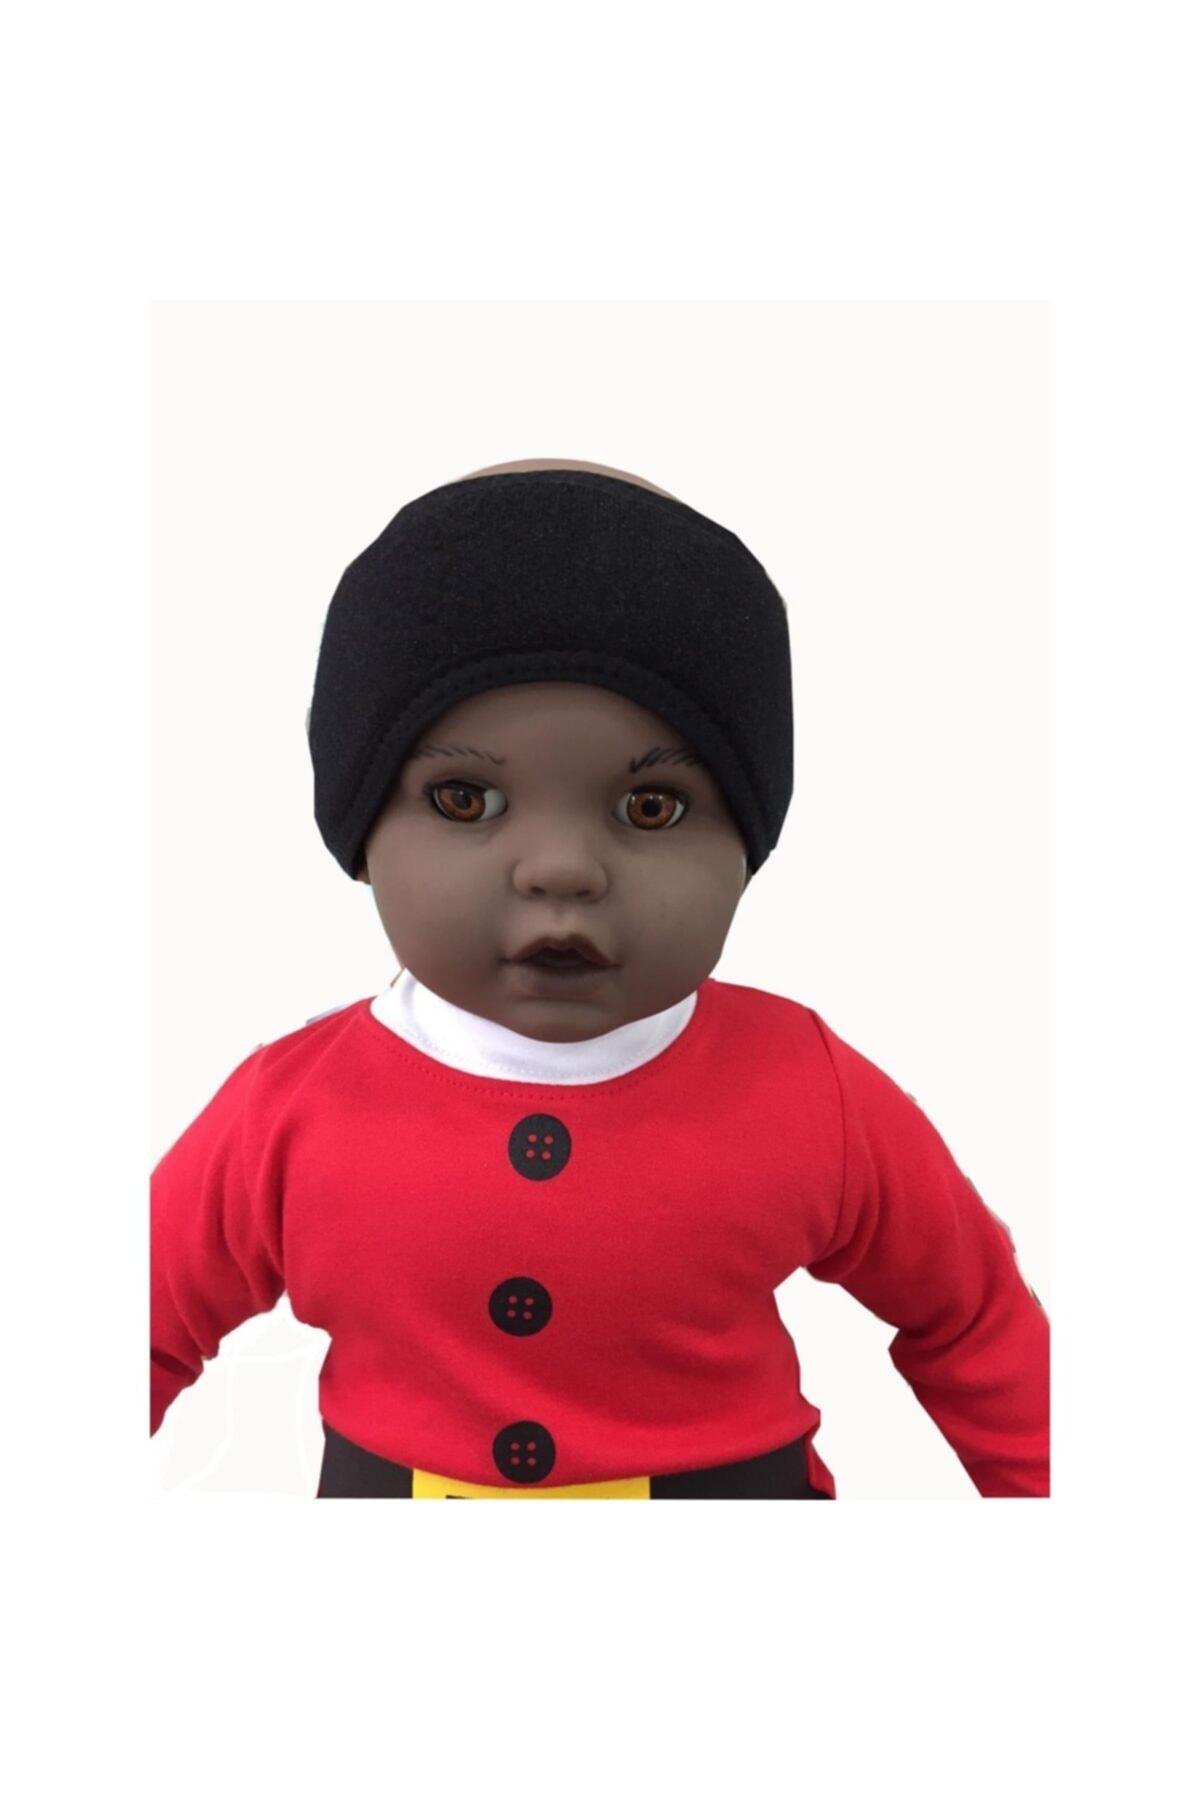 Ankara Medikal Kız Bebek Kepçe Kulak Bandı 0-2 Yaş 1